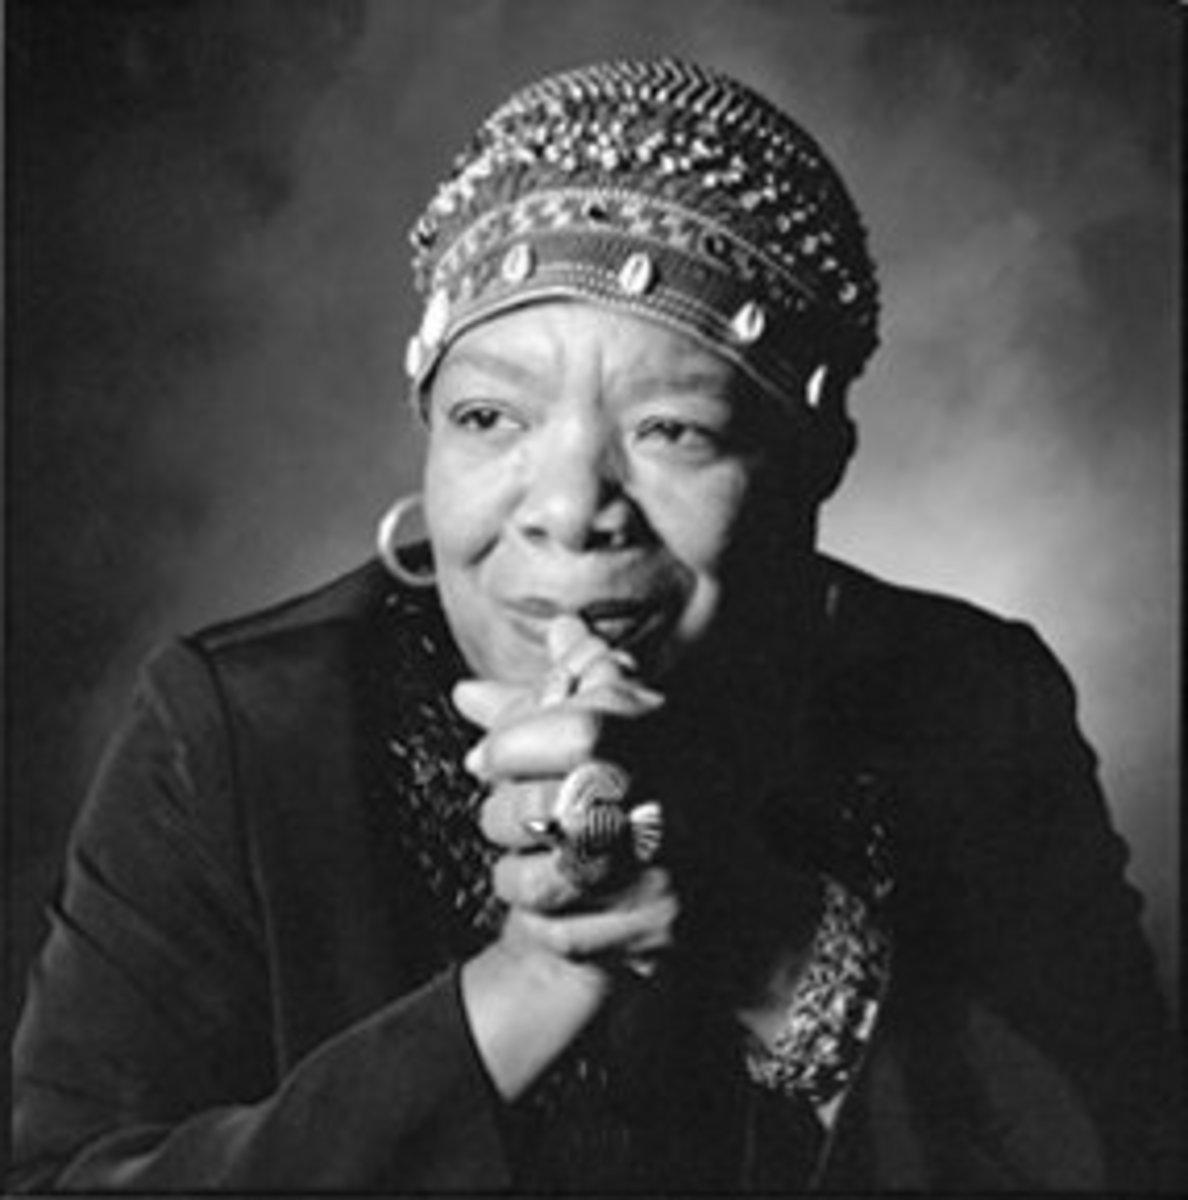 Ysis Of Poem Phenomenal Woman By Maya Angelou